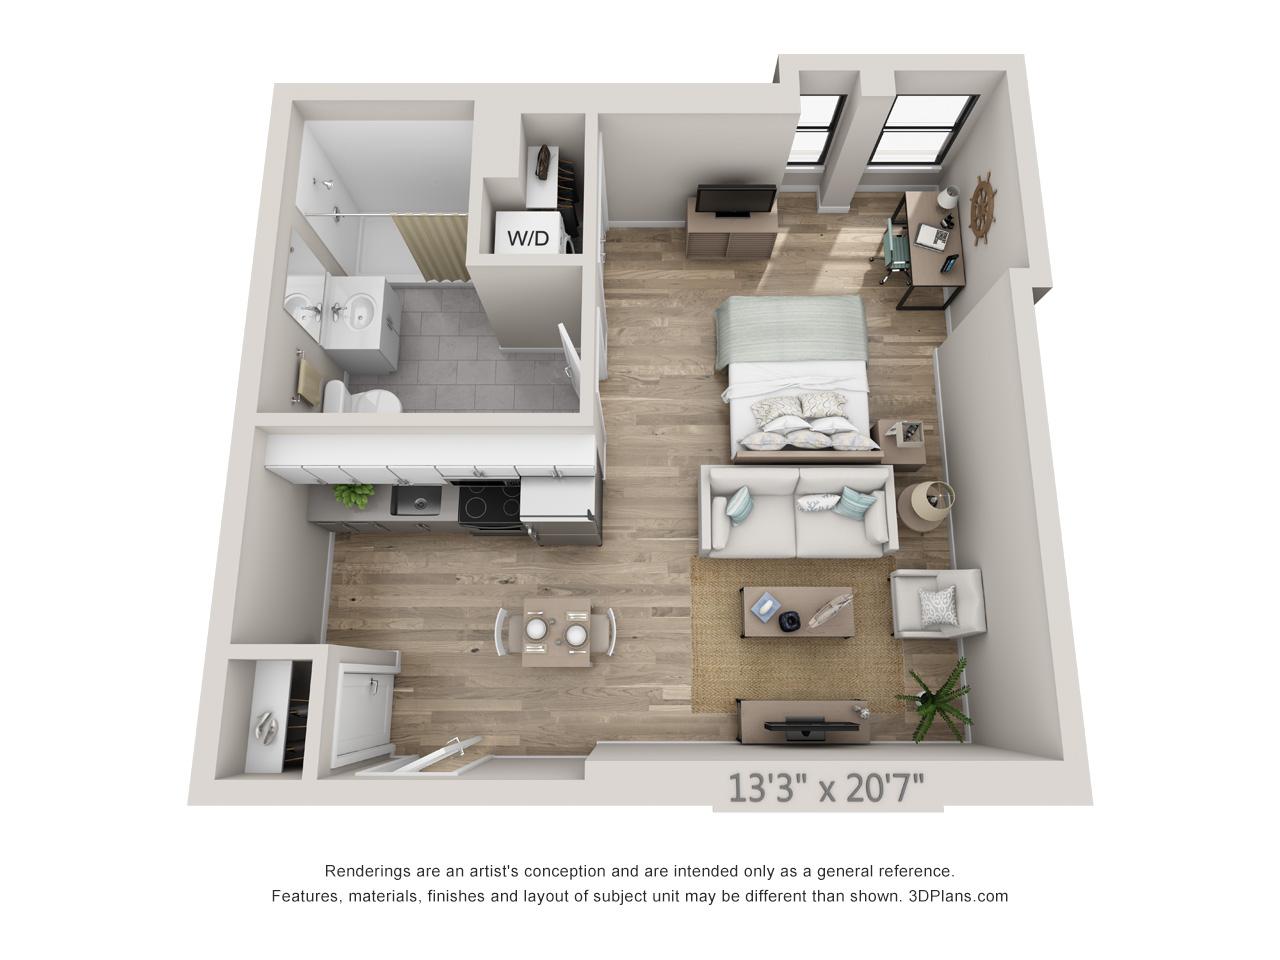 apartments in center city philadelphia - modern apartments - avenir